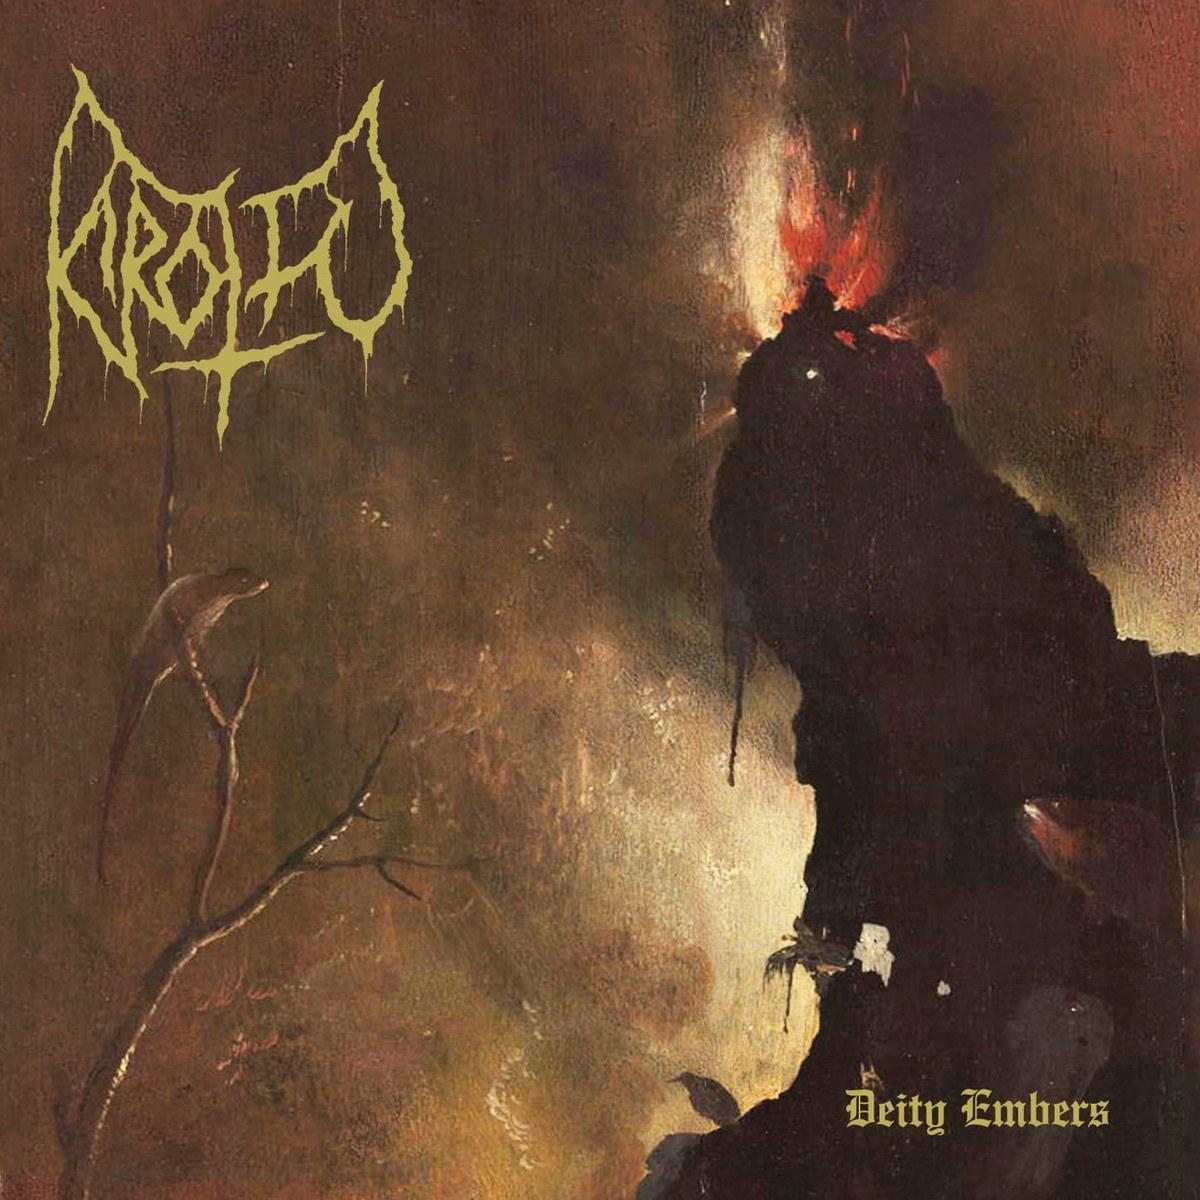 Reviews for Kirottu - Deity Embers